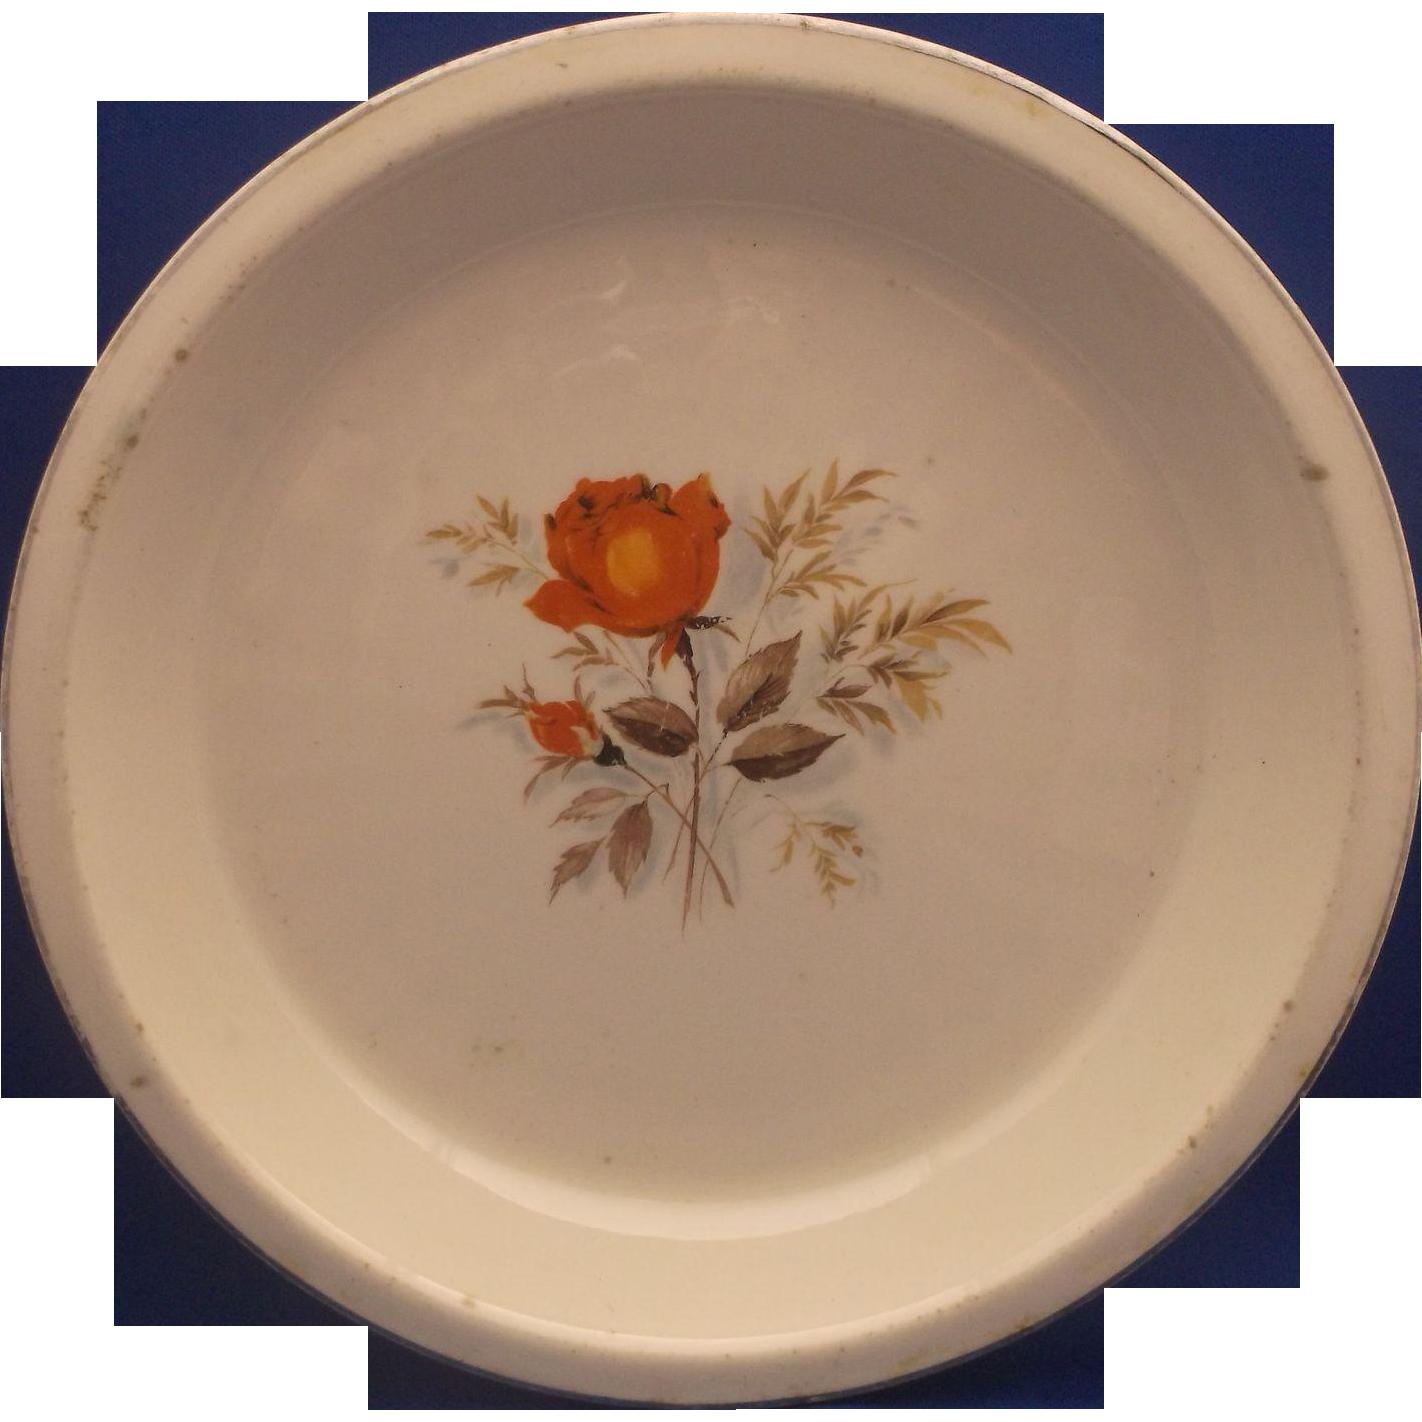 Paden City Pottery Pie Plate Baker Orange Rose Gold Trim